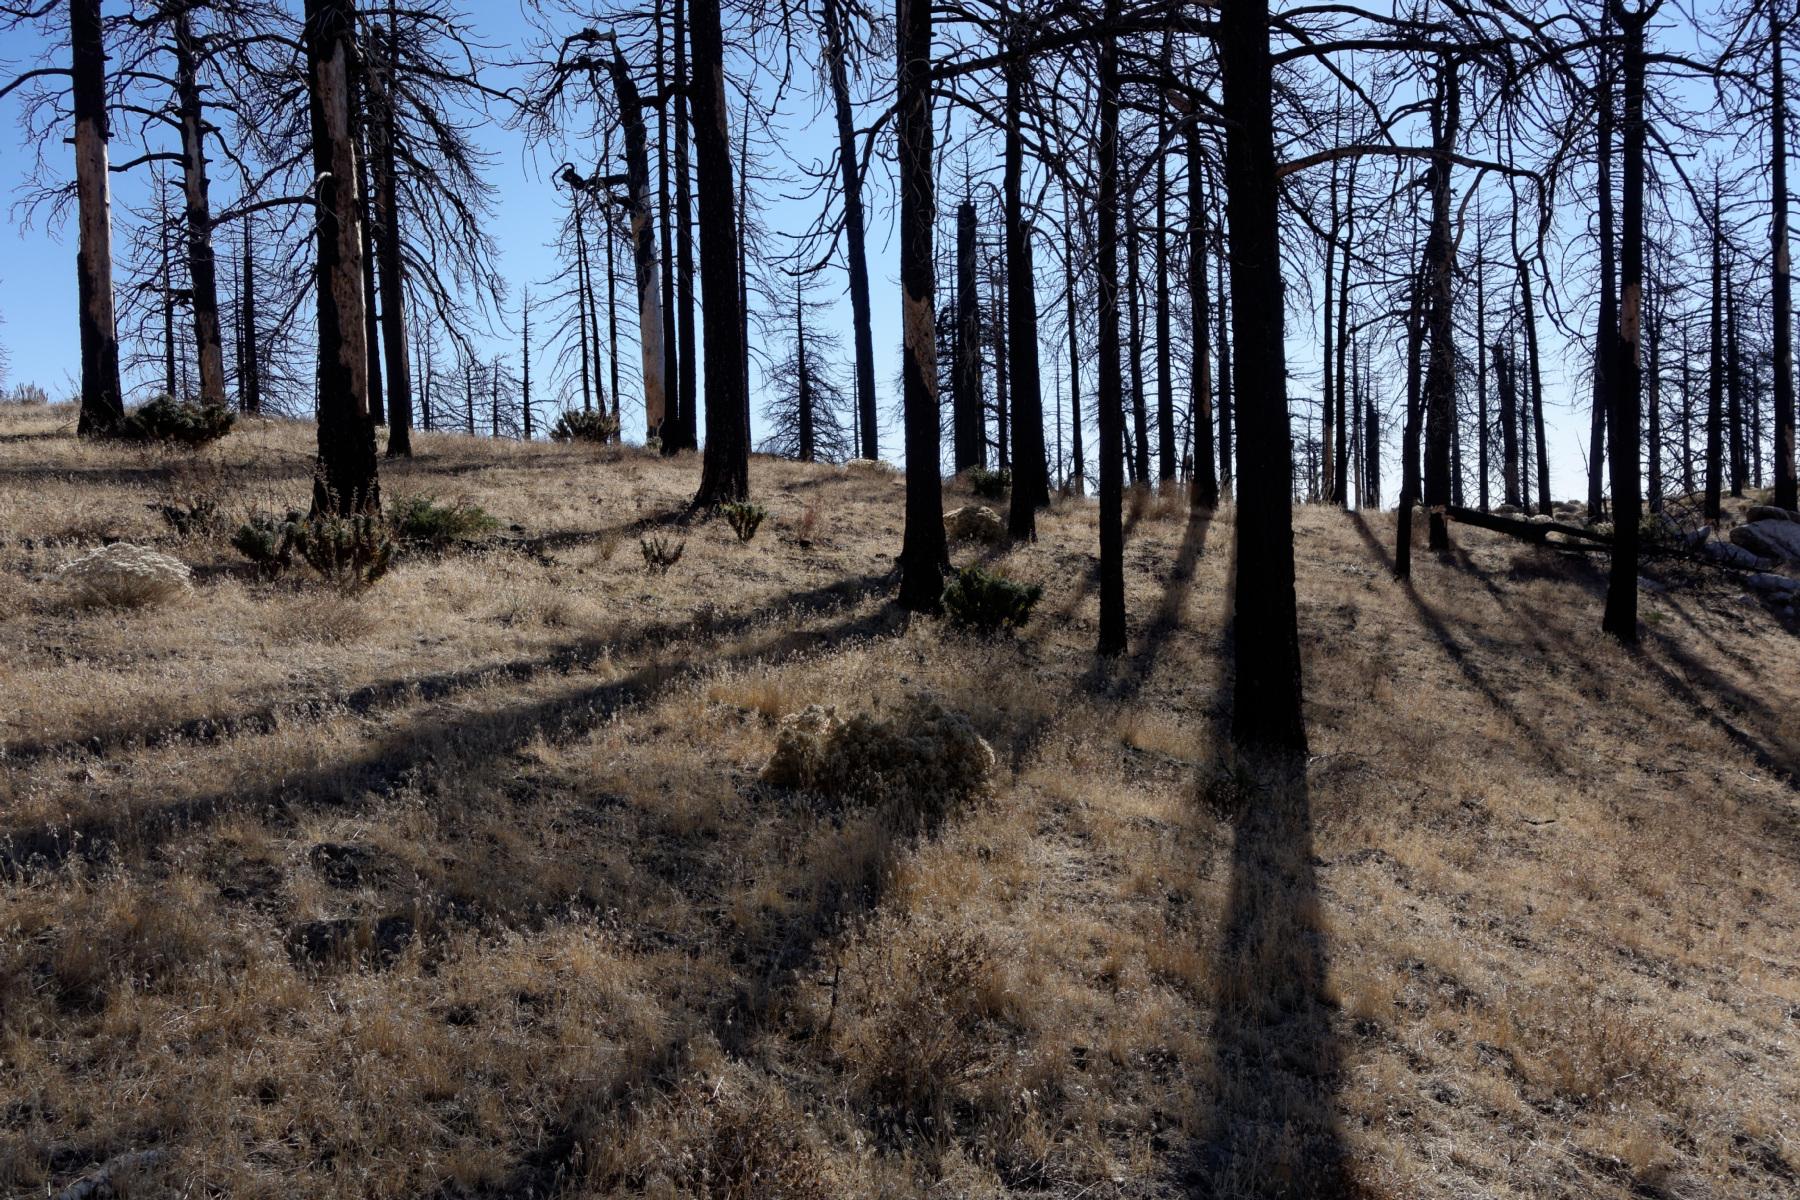 Rabbit Peak, Granite Mtn, Round Top, Iron Mtn – Photo Gallery